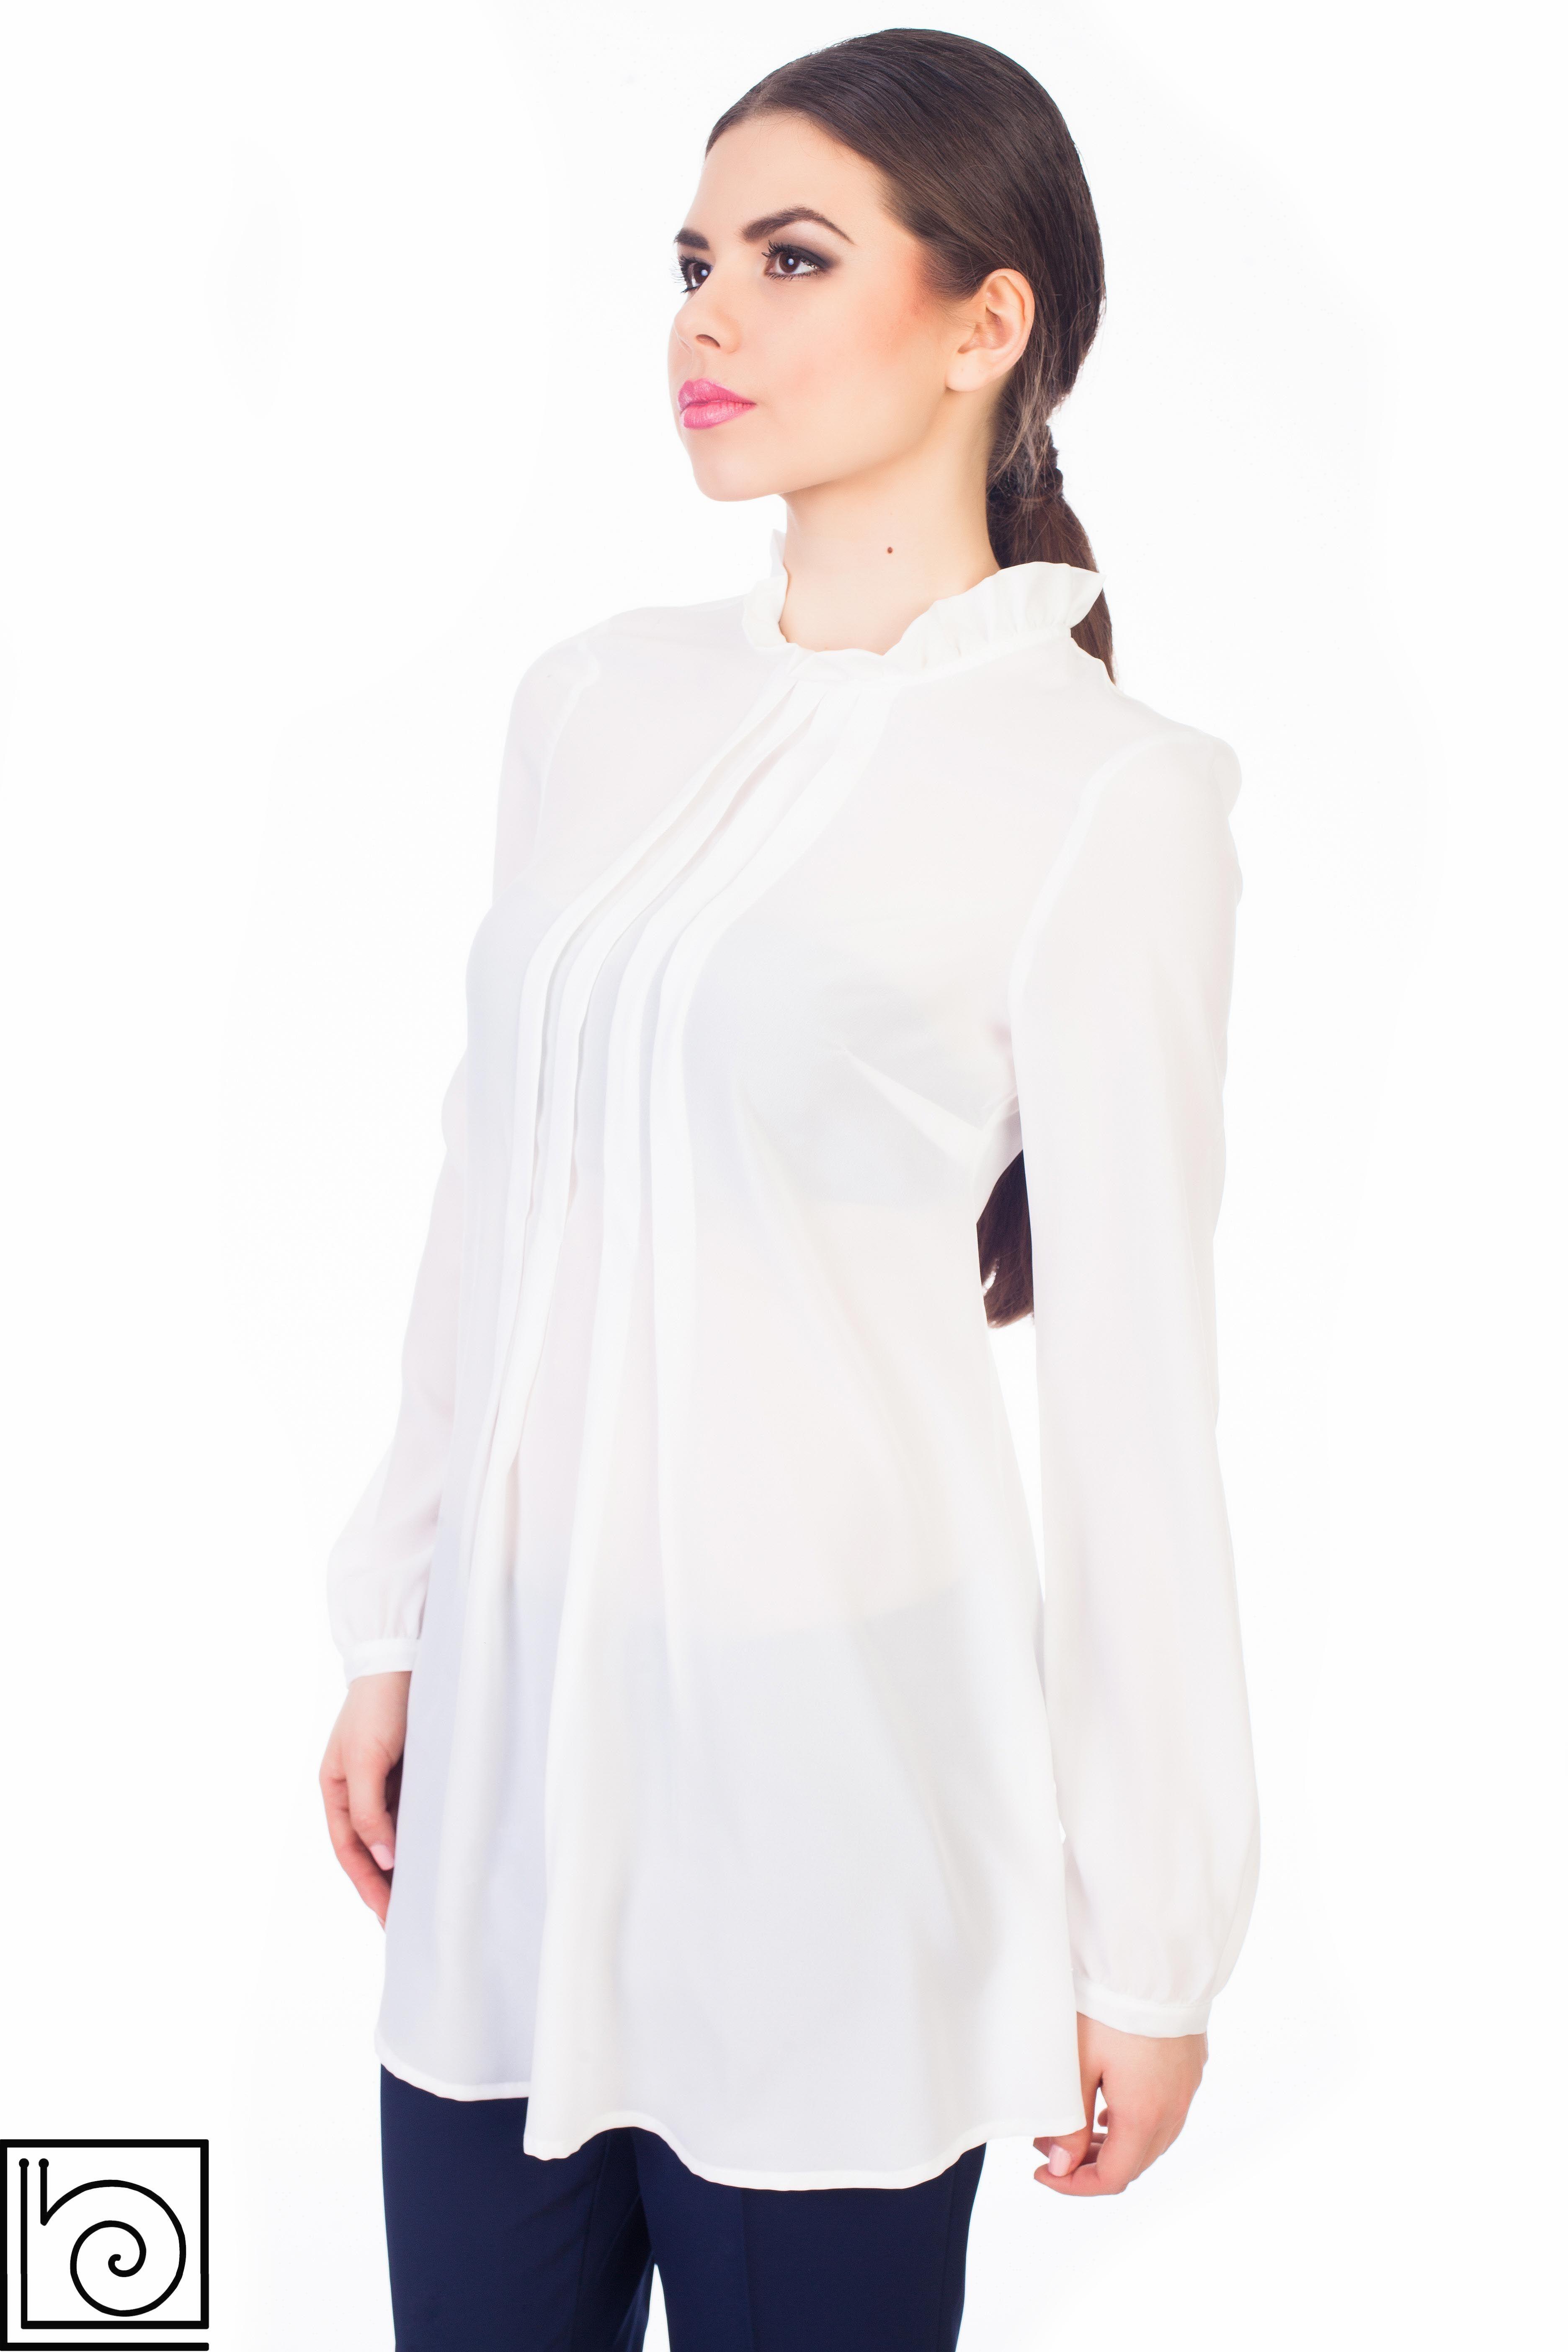 268df79f506 Блузка белая нарядная